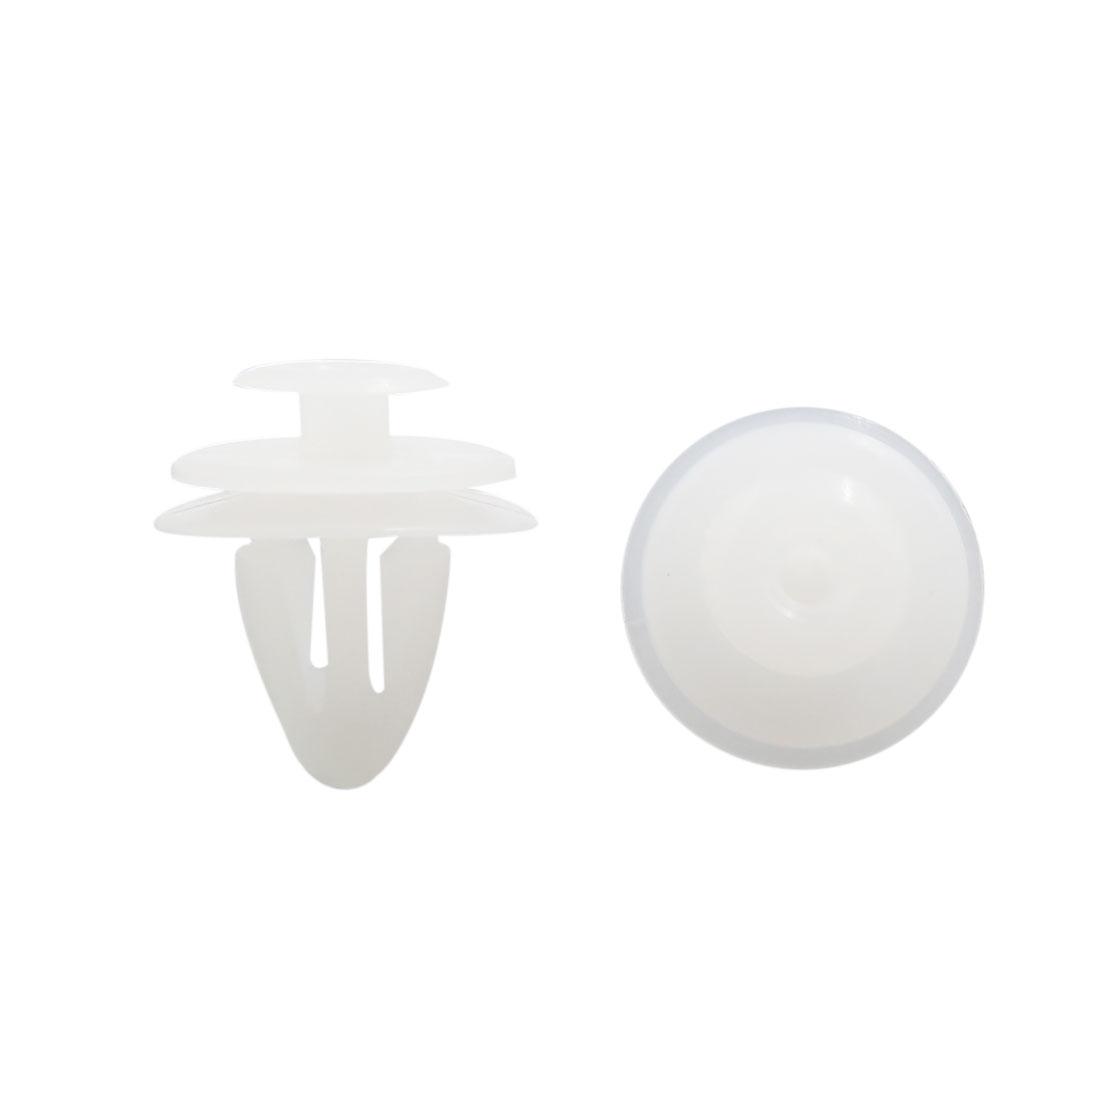 30 Pcs White Fastener Bumper Push Clips Plastic Rivets 10mm x 12mm x 17mm